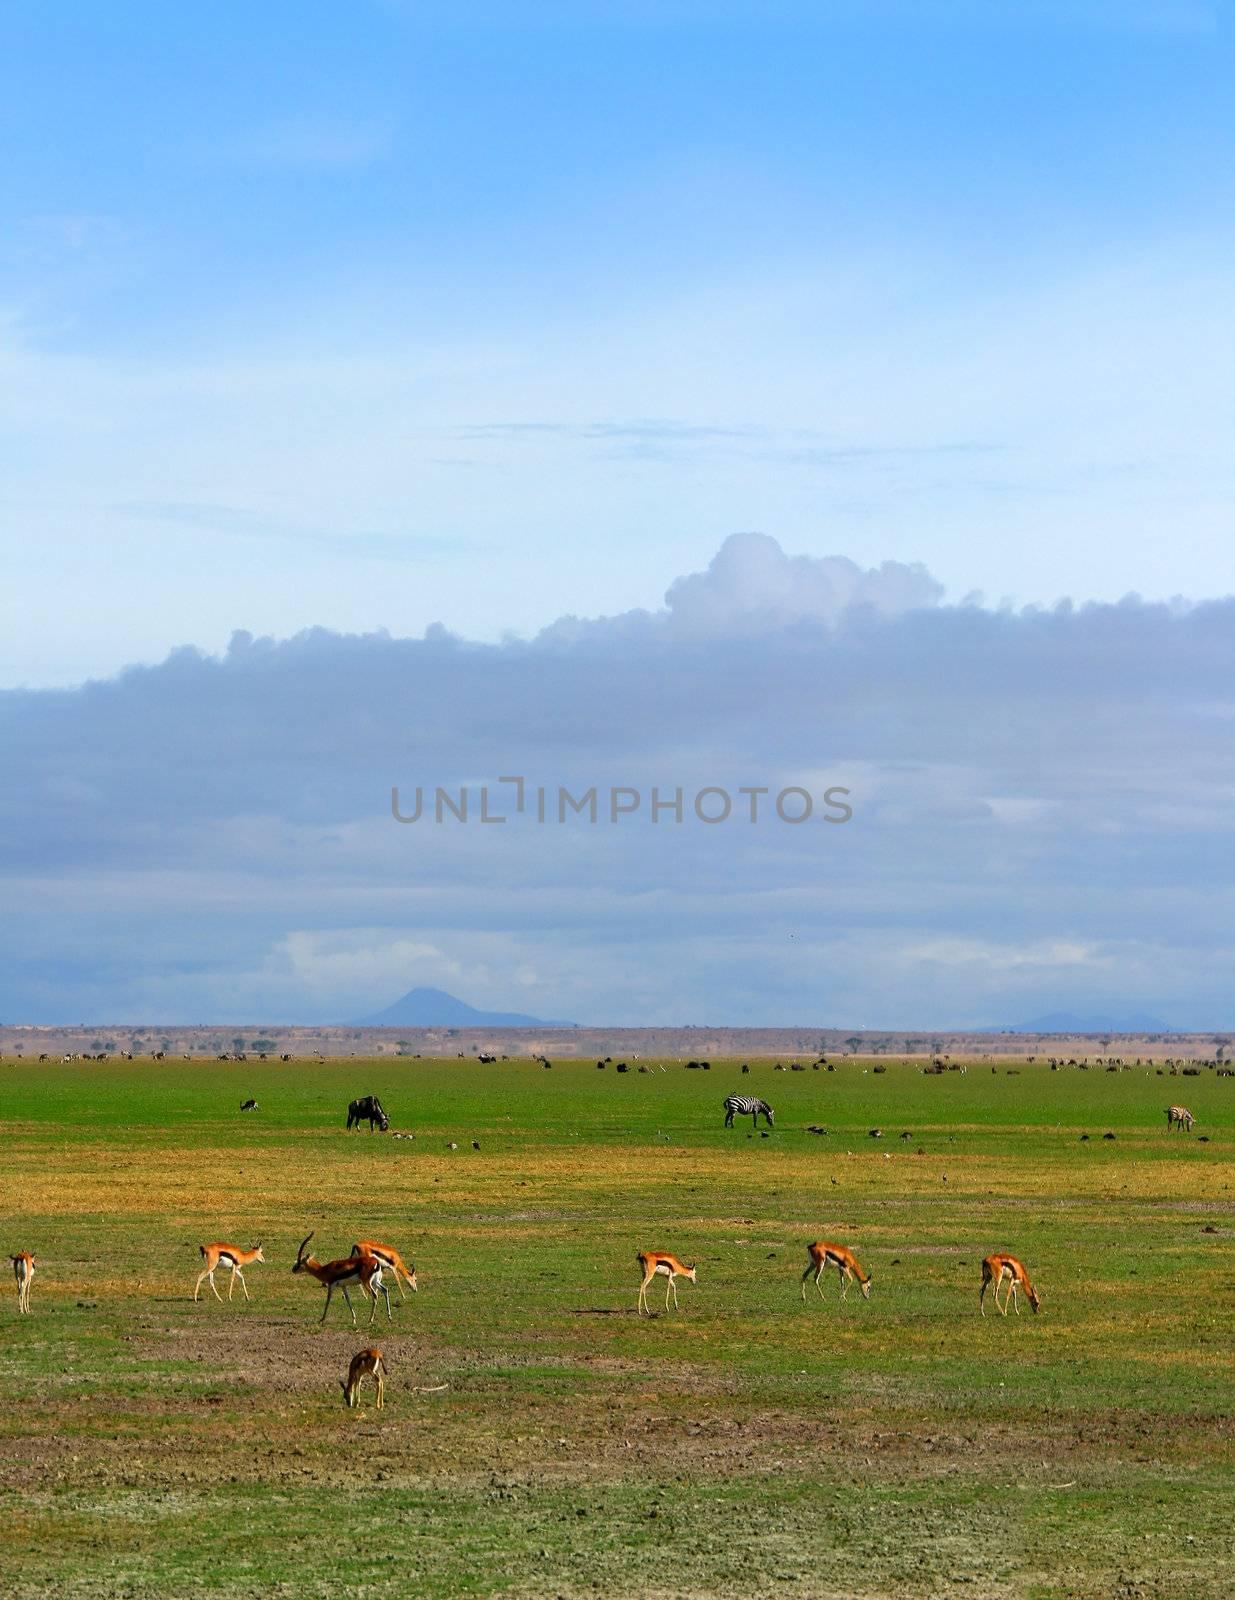 African Wild animals grazing. Kenya. Amboseli national park.